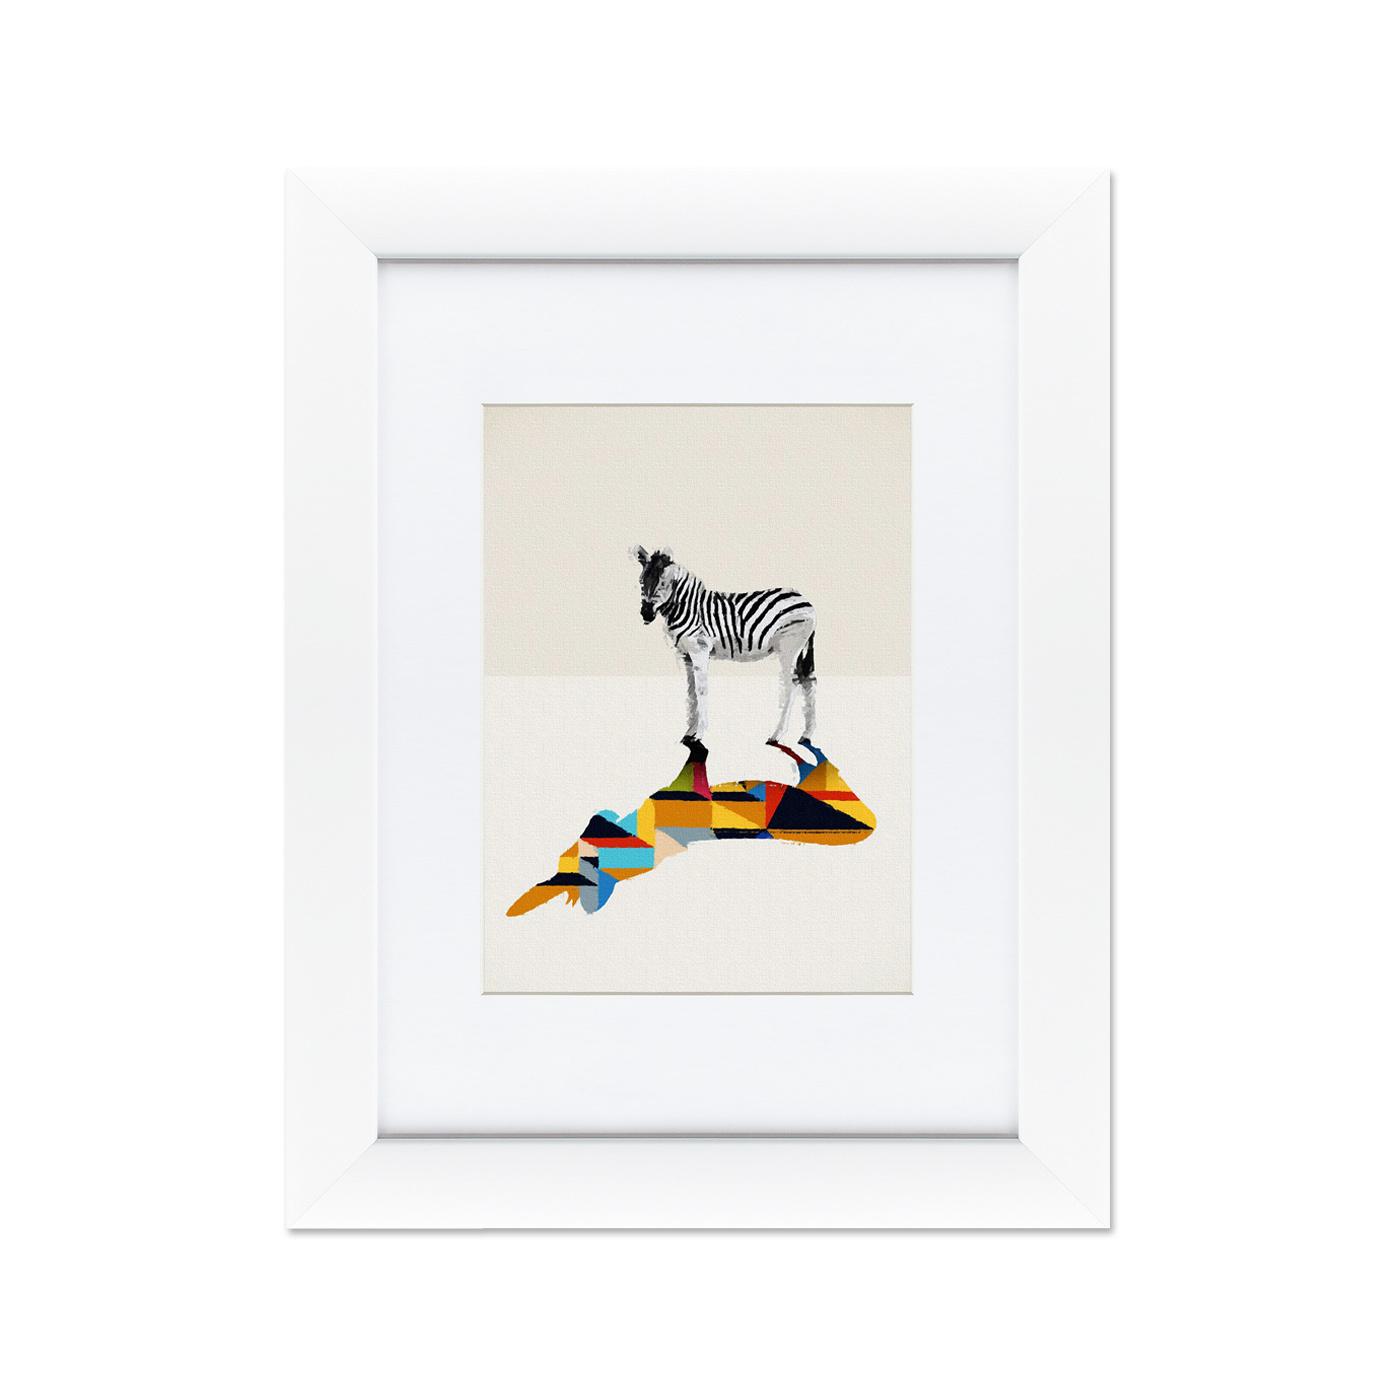 {} Картины в Квартиру Картина Зебра (35х45 см) картины в квартиру картина олень 2 35х45 см